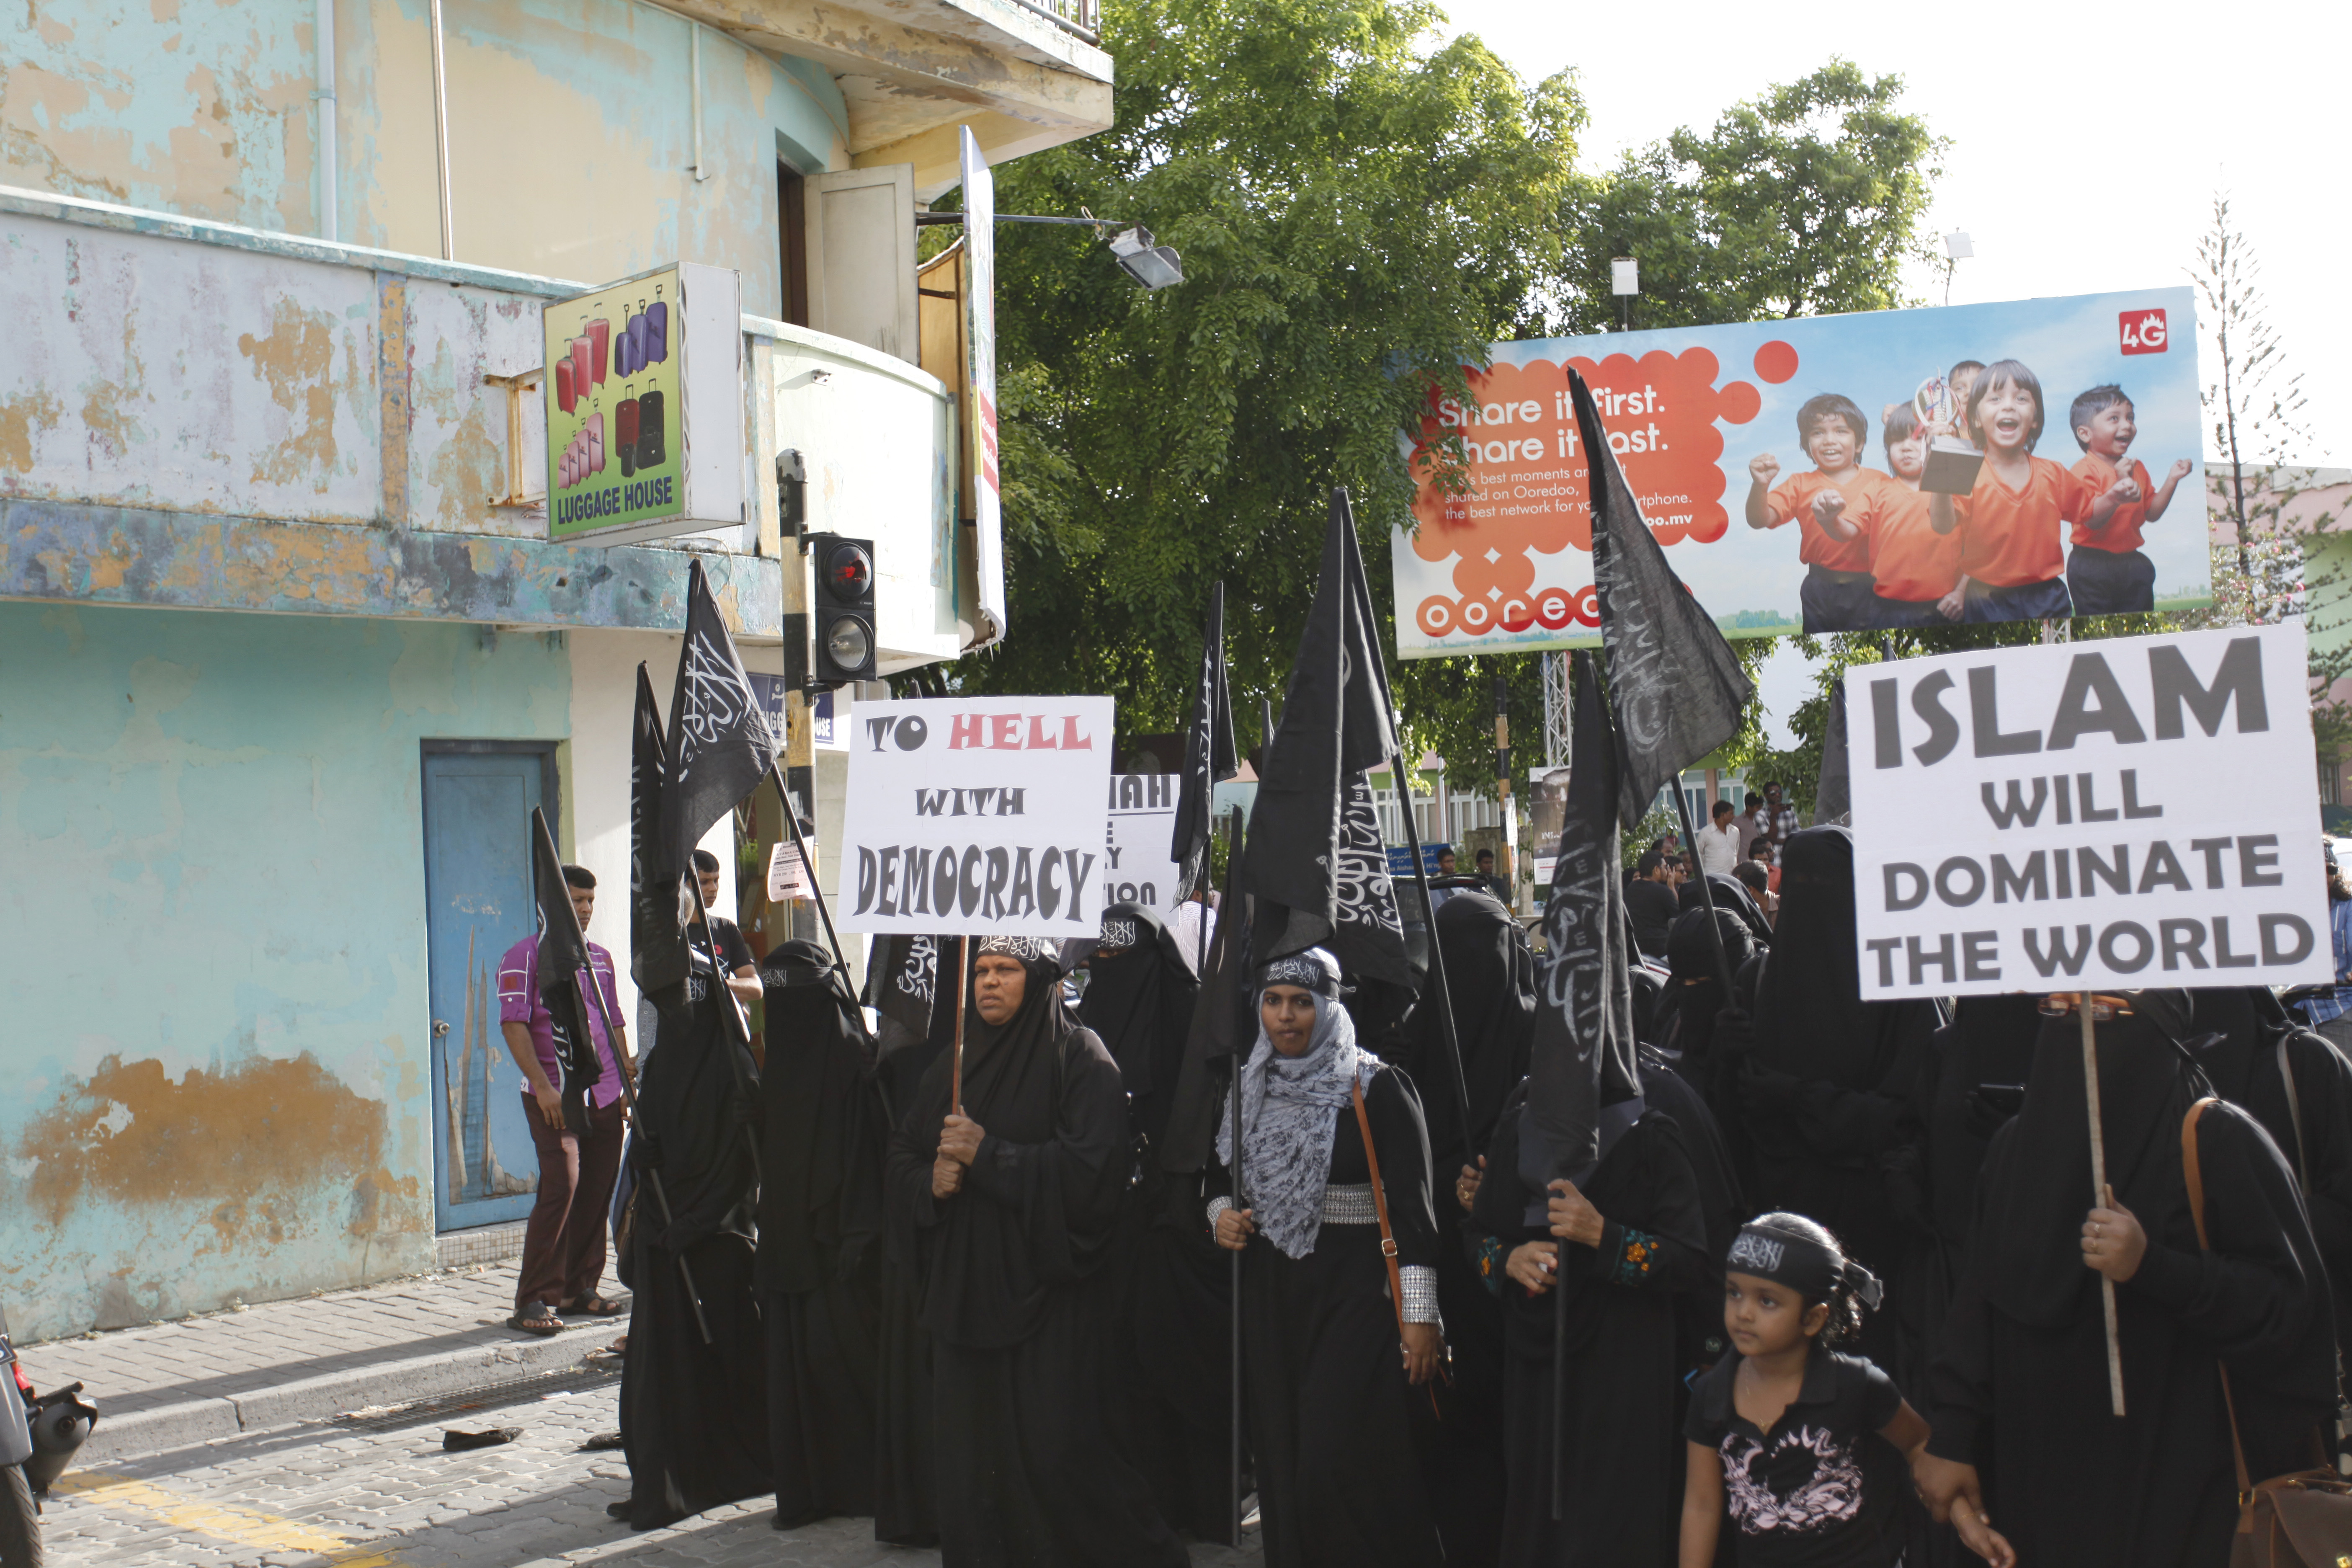 sharia - simple english wikipedia, the free encyclopedia